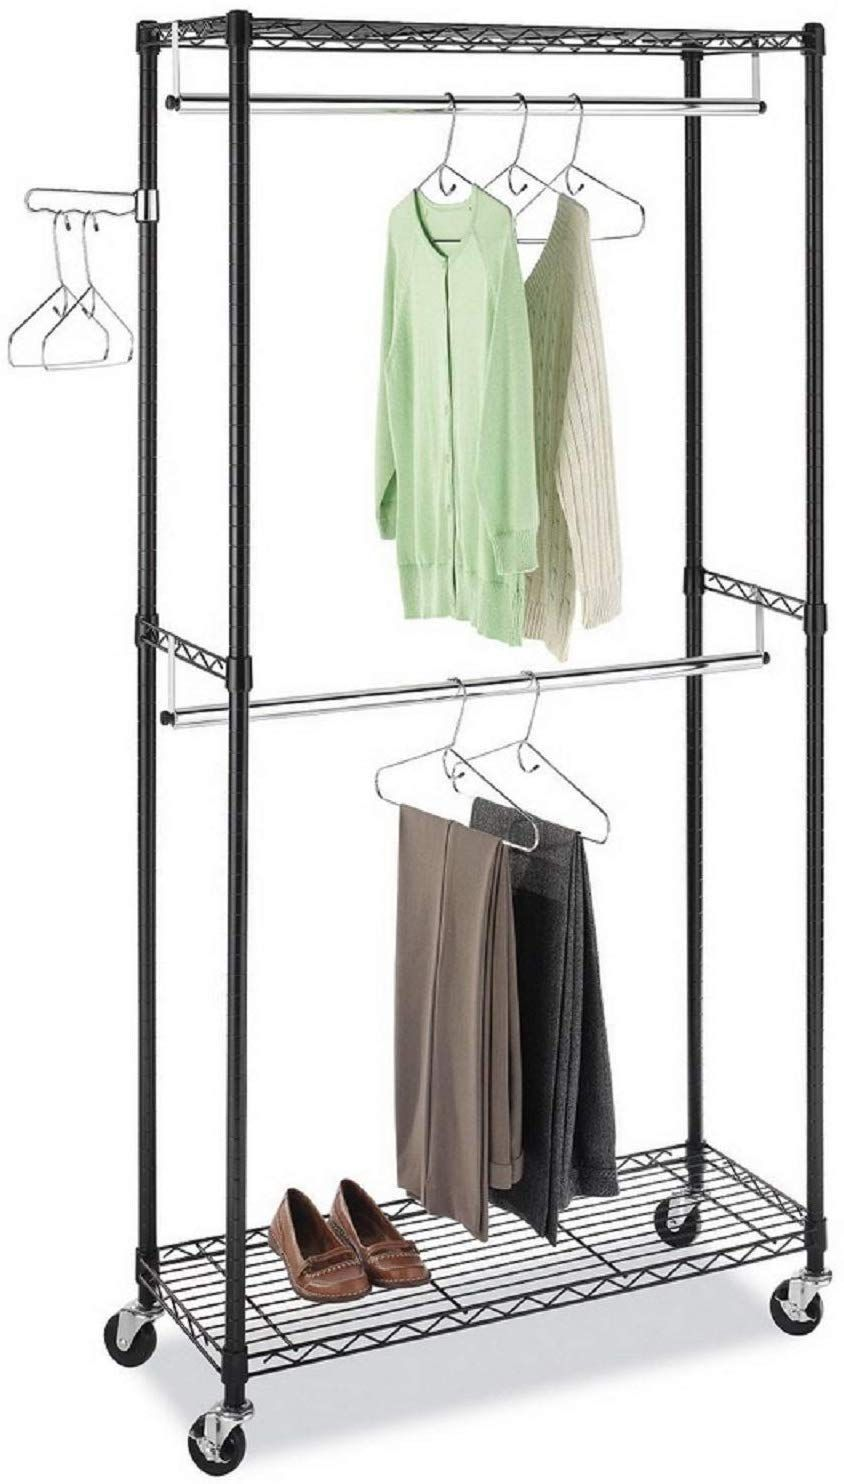 Heavy duty wire shelving wardrobe clothes closet 2tier